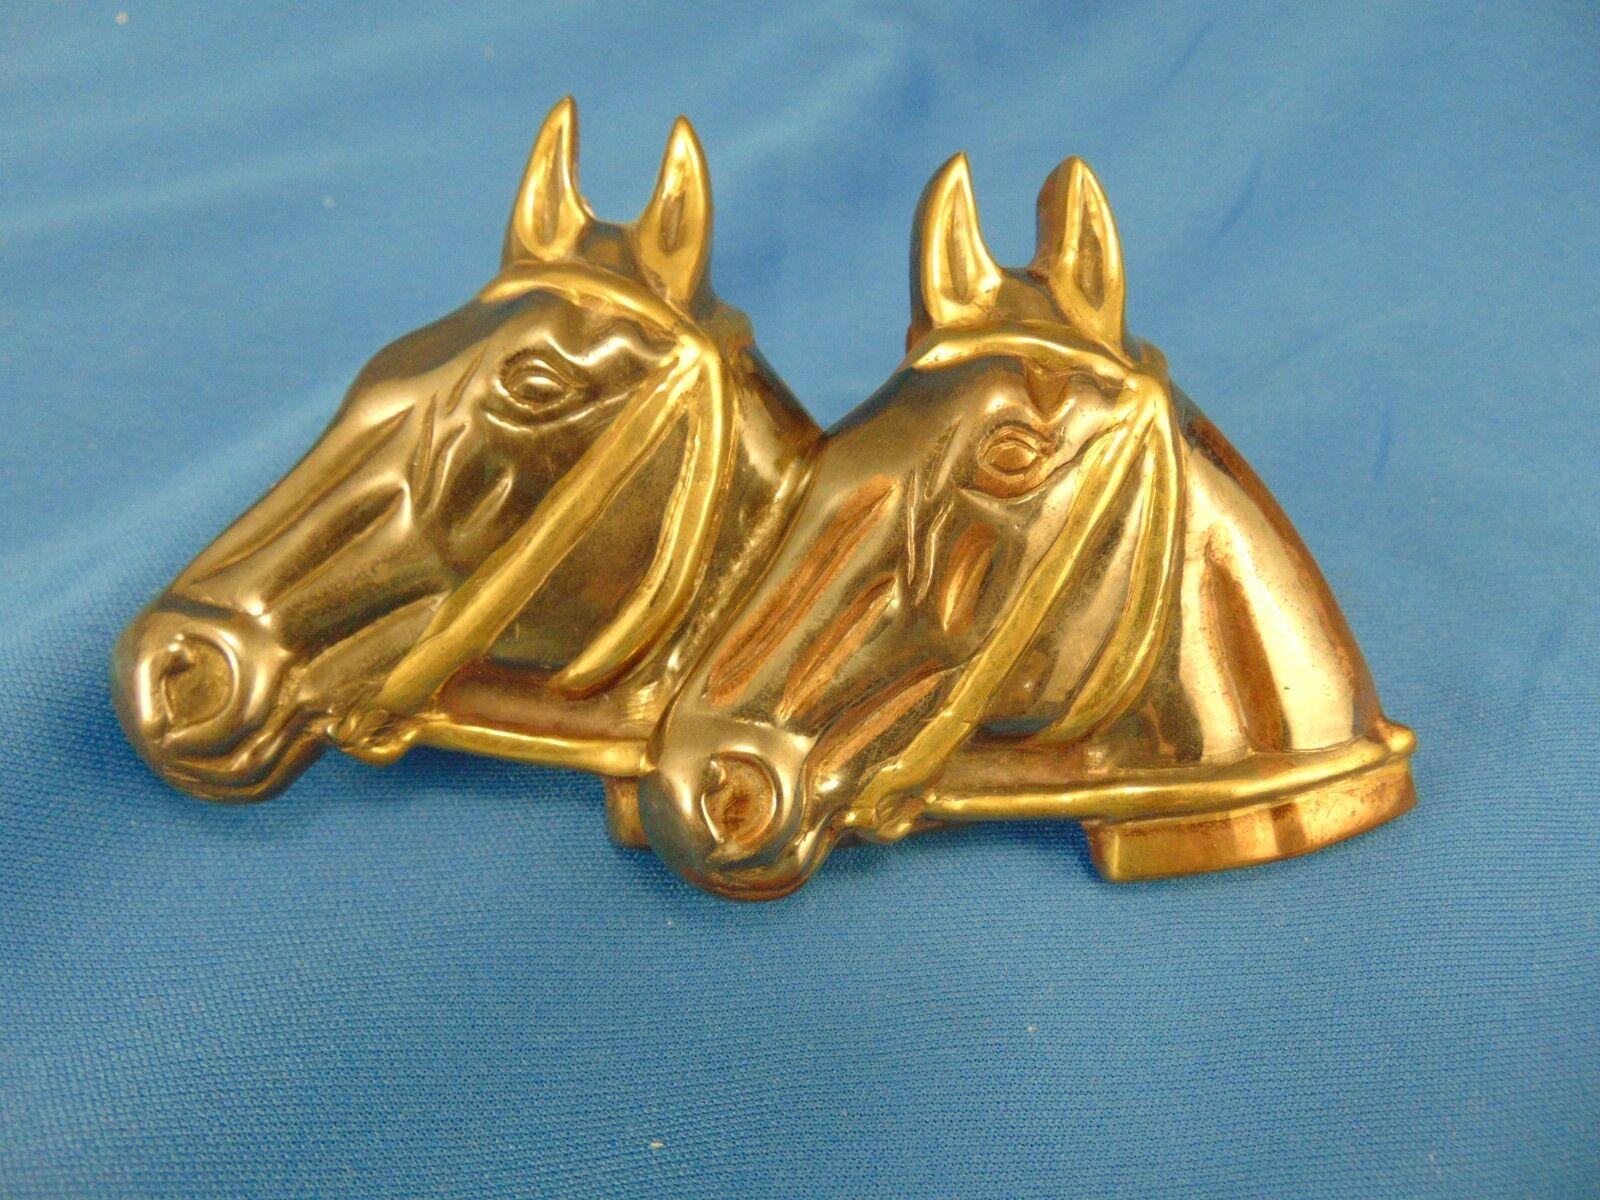 Belt buckle twin horse heads metal cowboy western rider farm ranch hand country